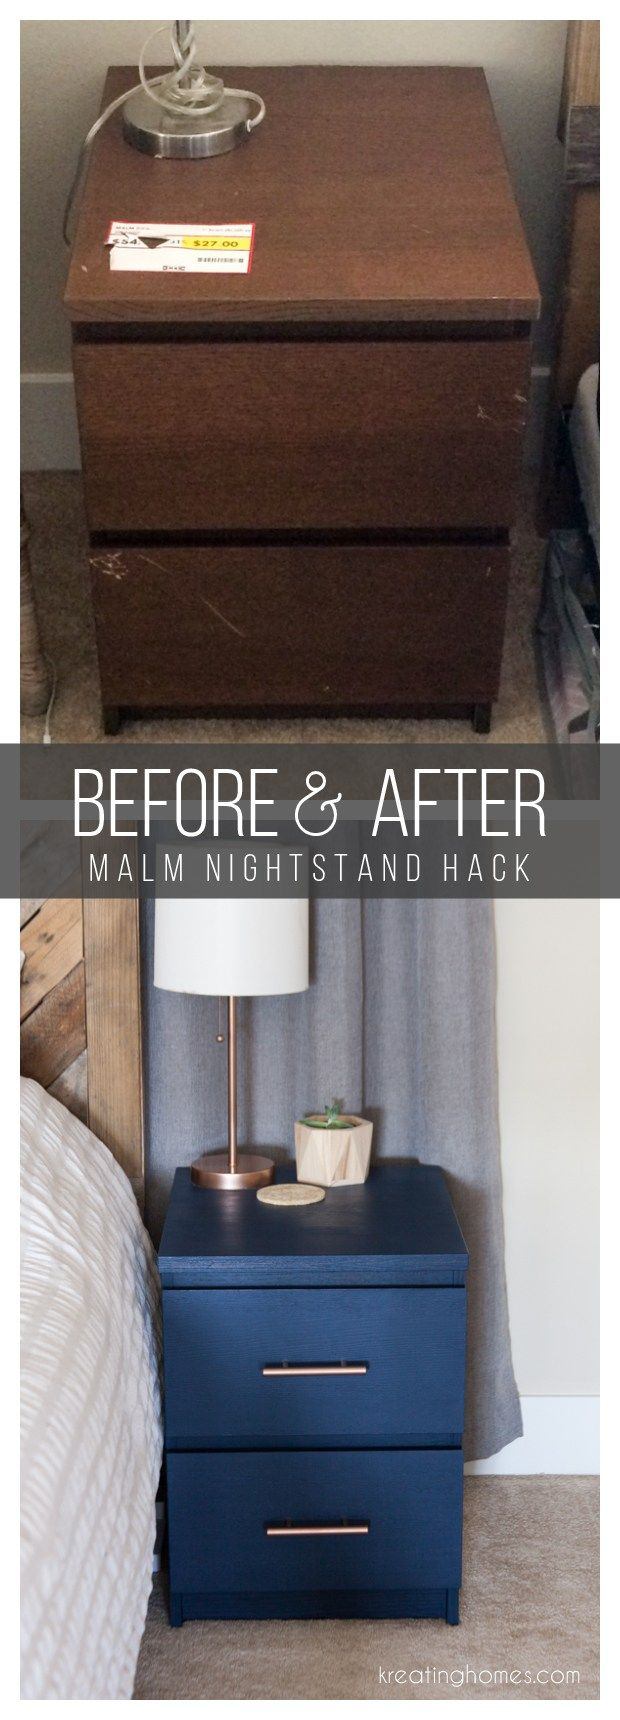 Ikea Nightstand Hack